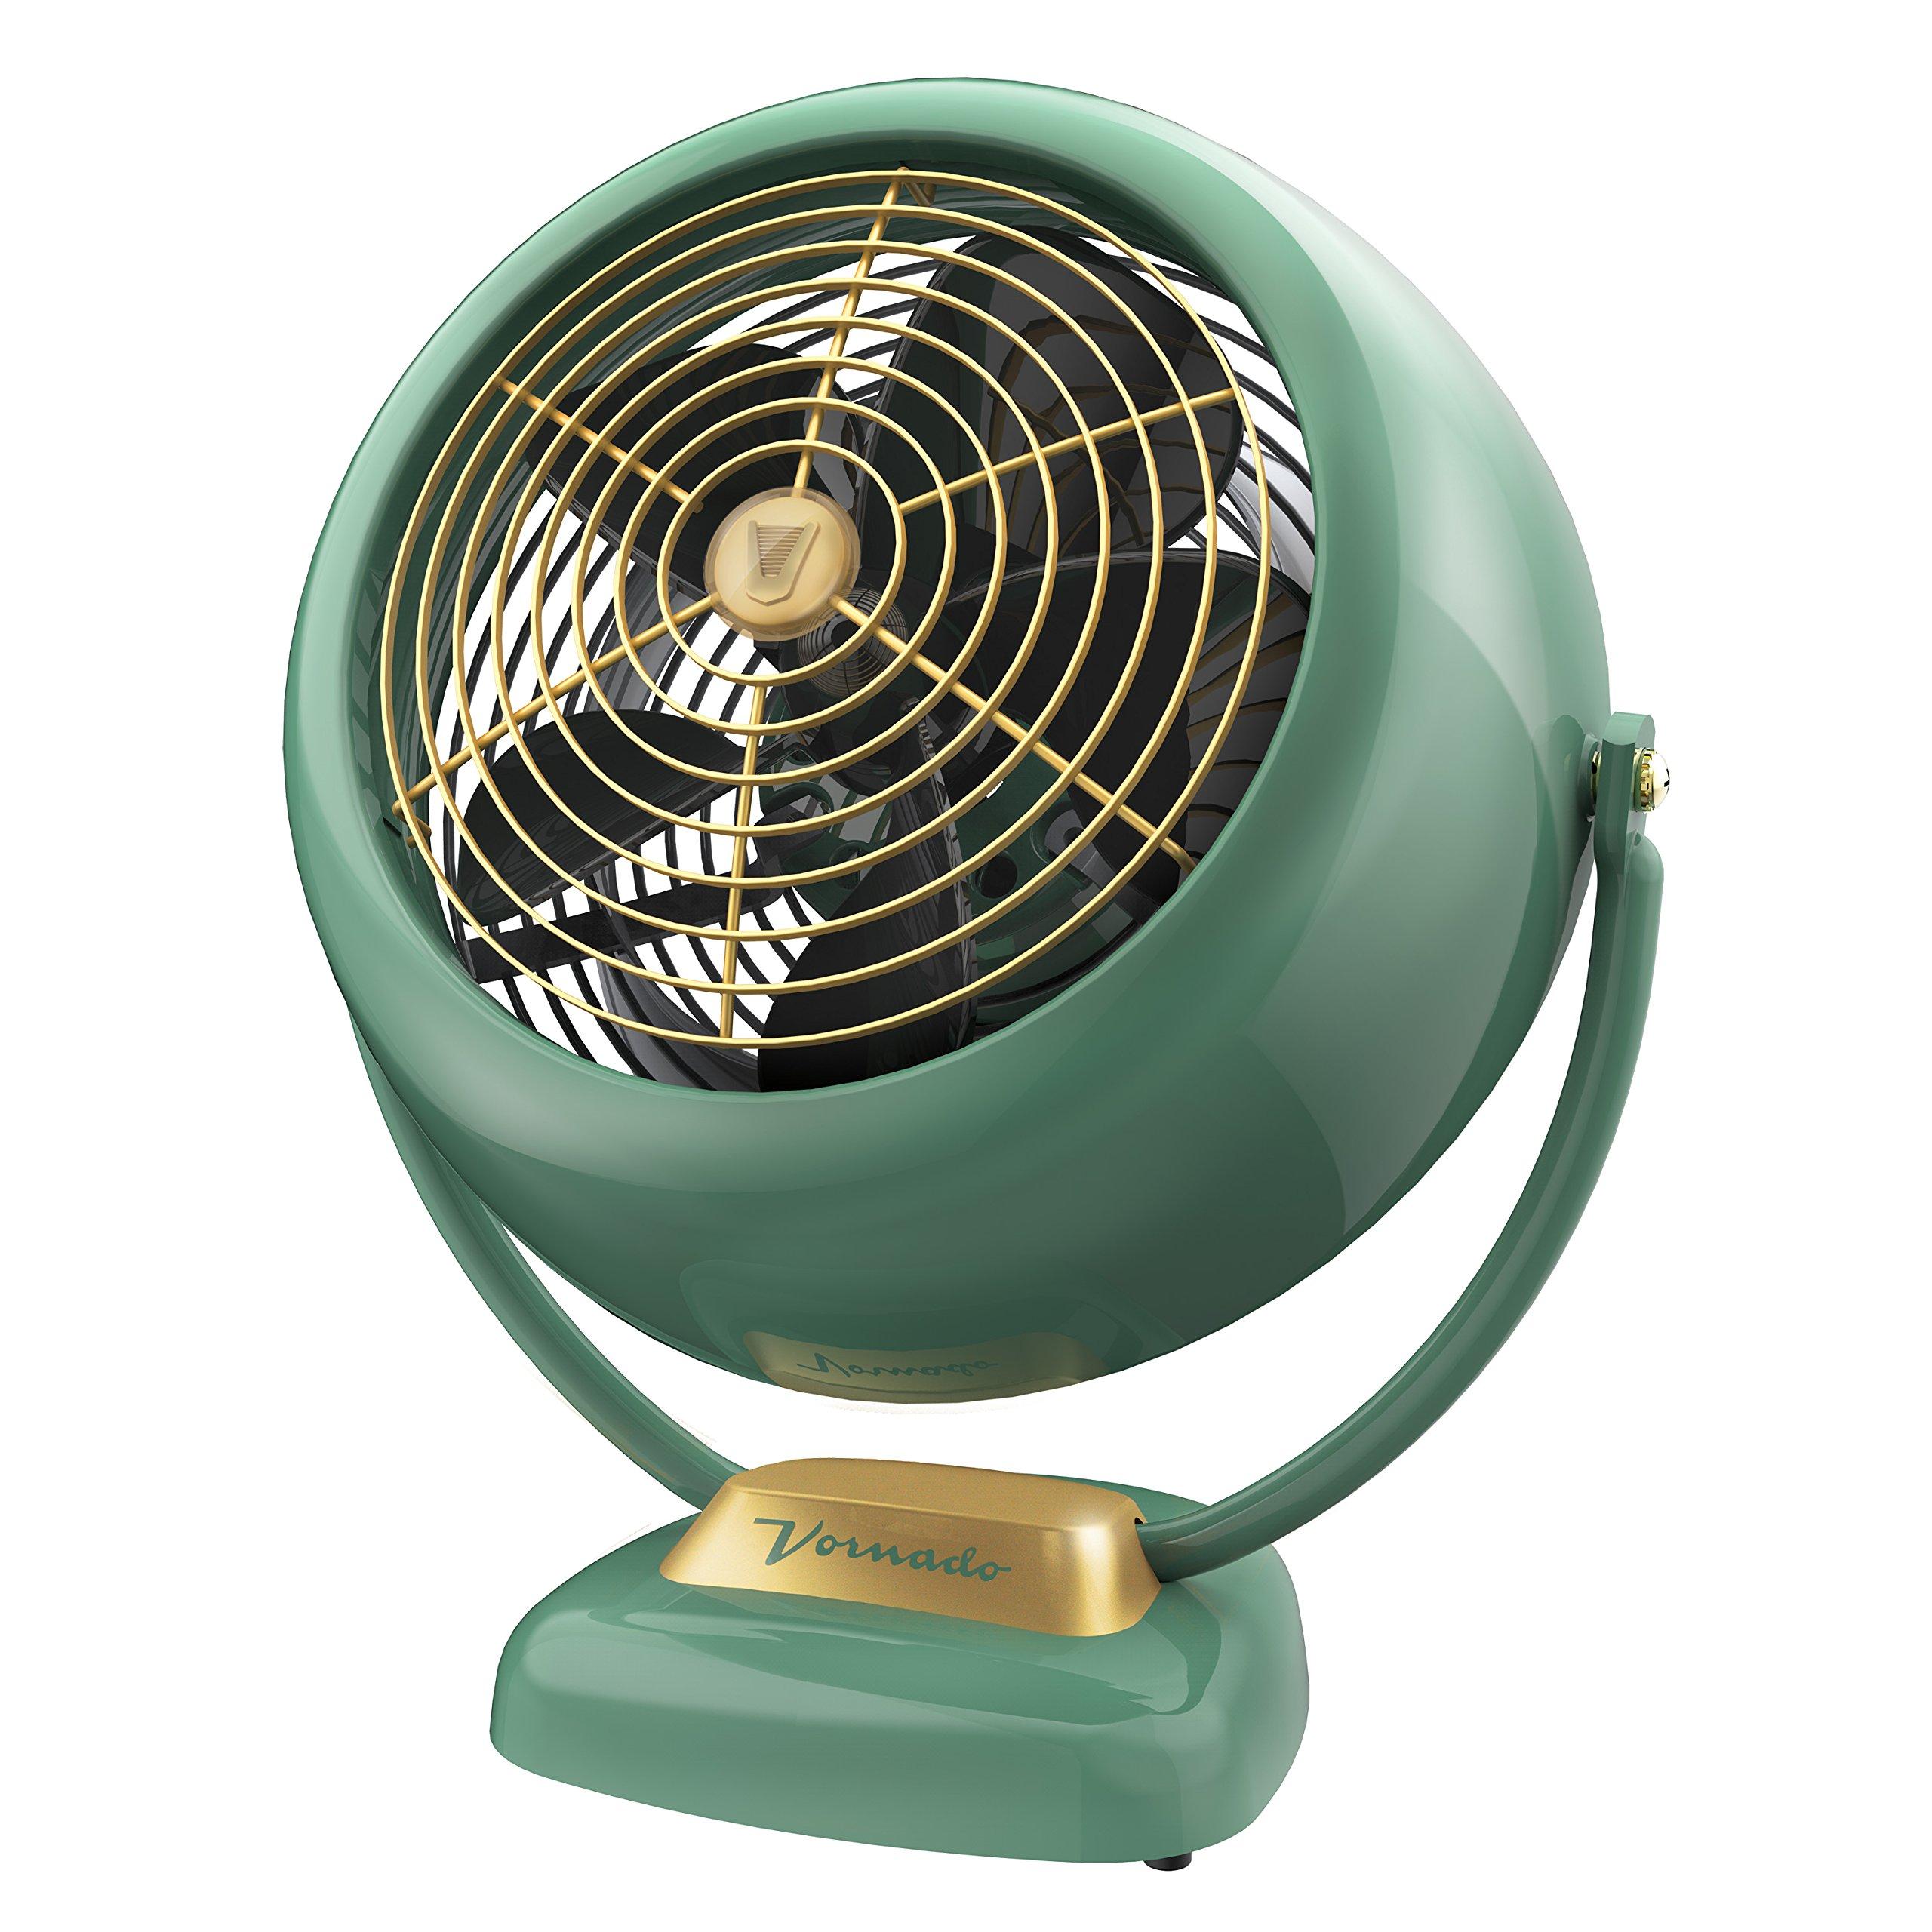 Vornado VFAN Sr. Vintage Air Circulator Fan, Green by Vornado